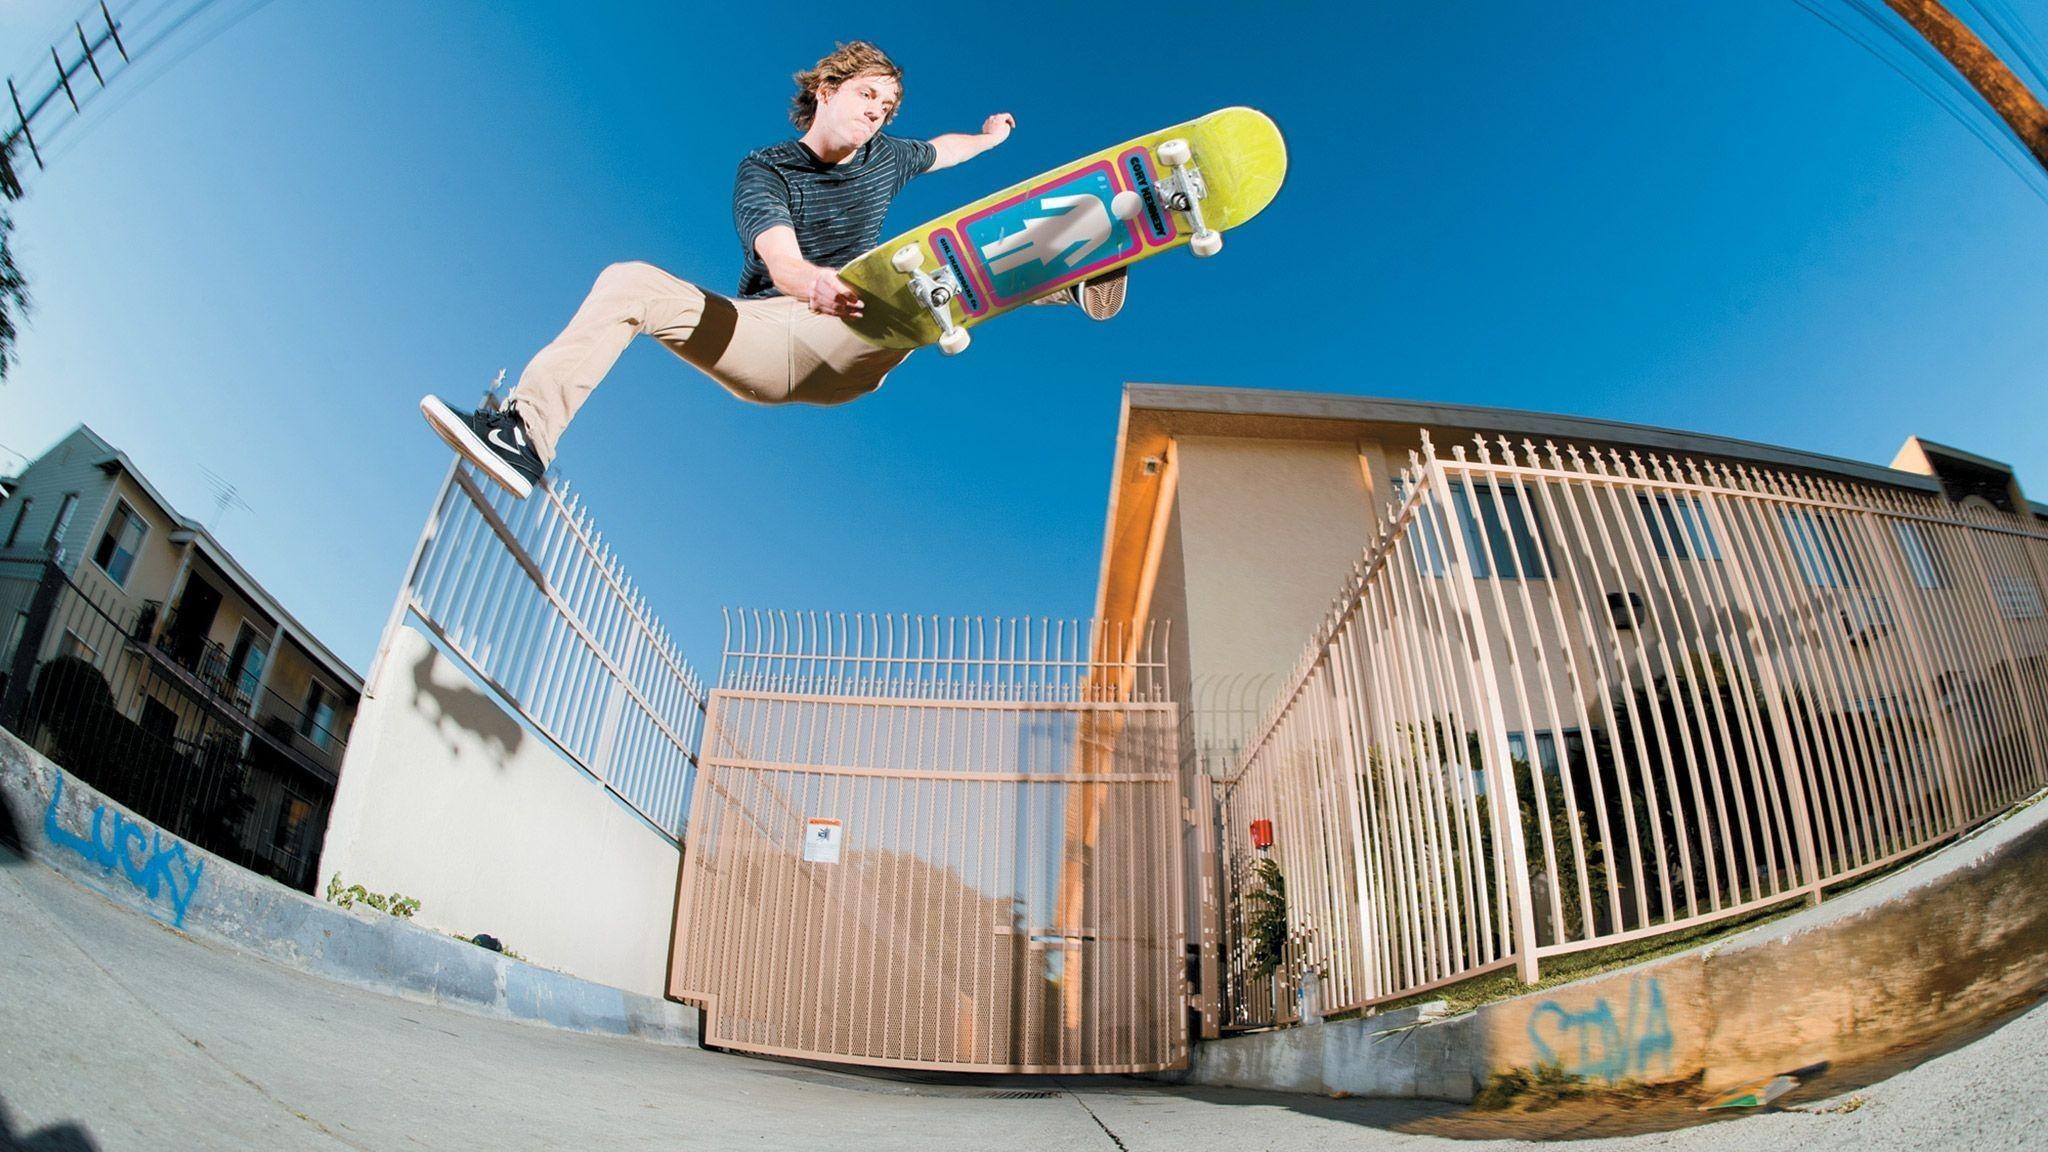 Girl Skateboards history in photos-20-Year-Old Girl